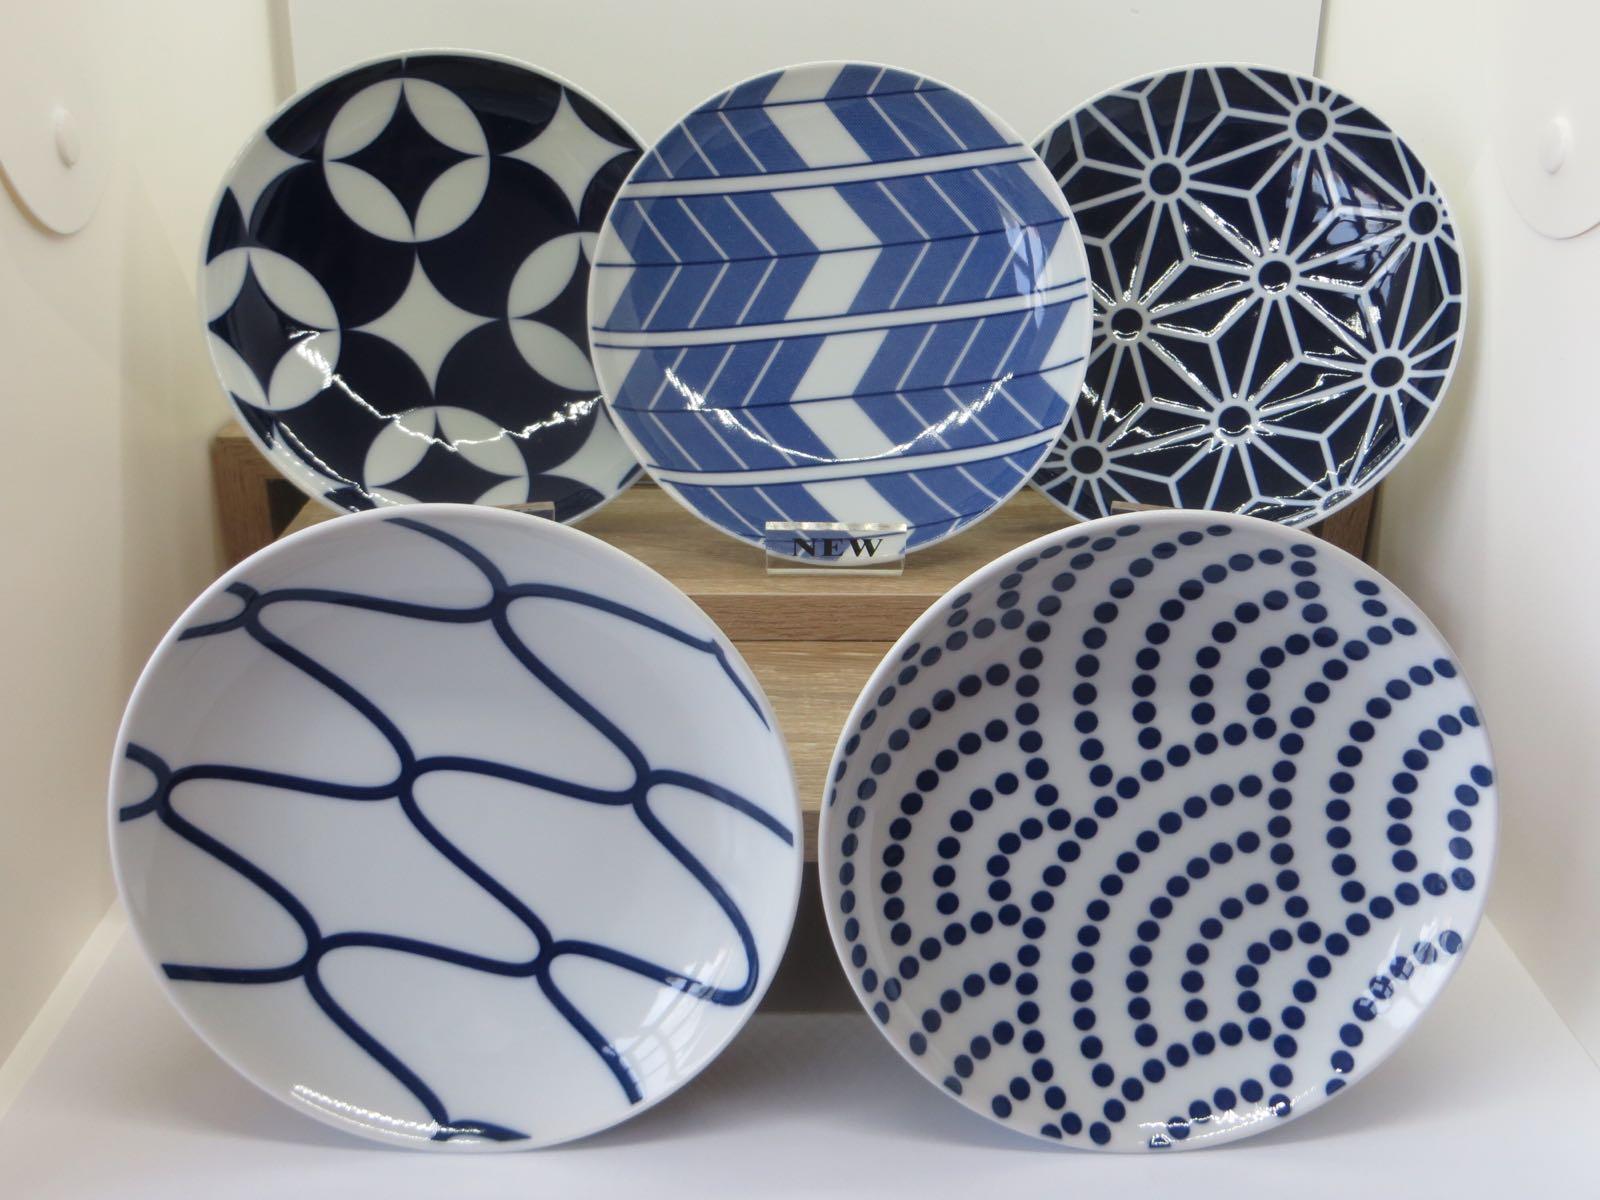 KIHARA Komon 15cm Plate Set (5 pieces)